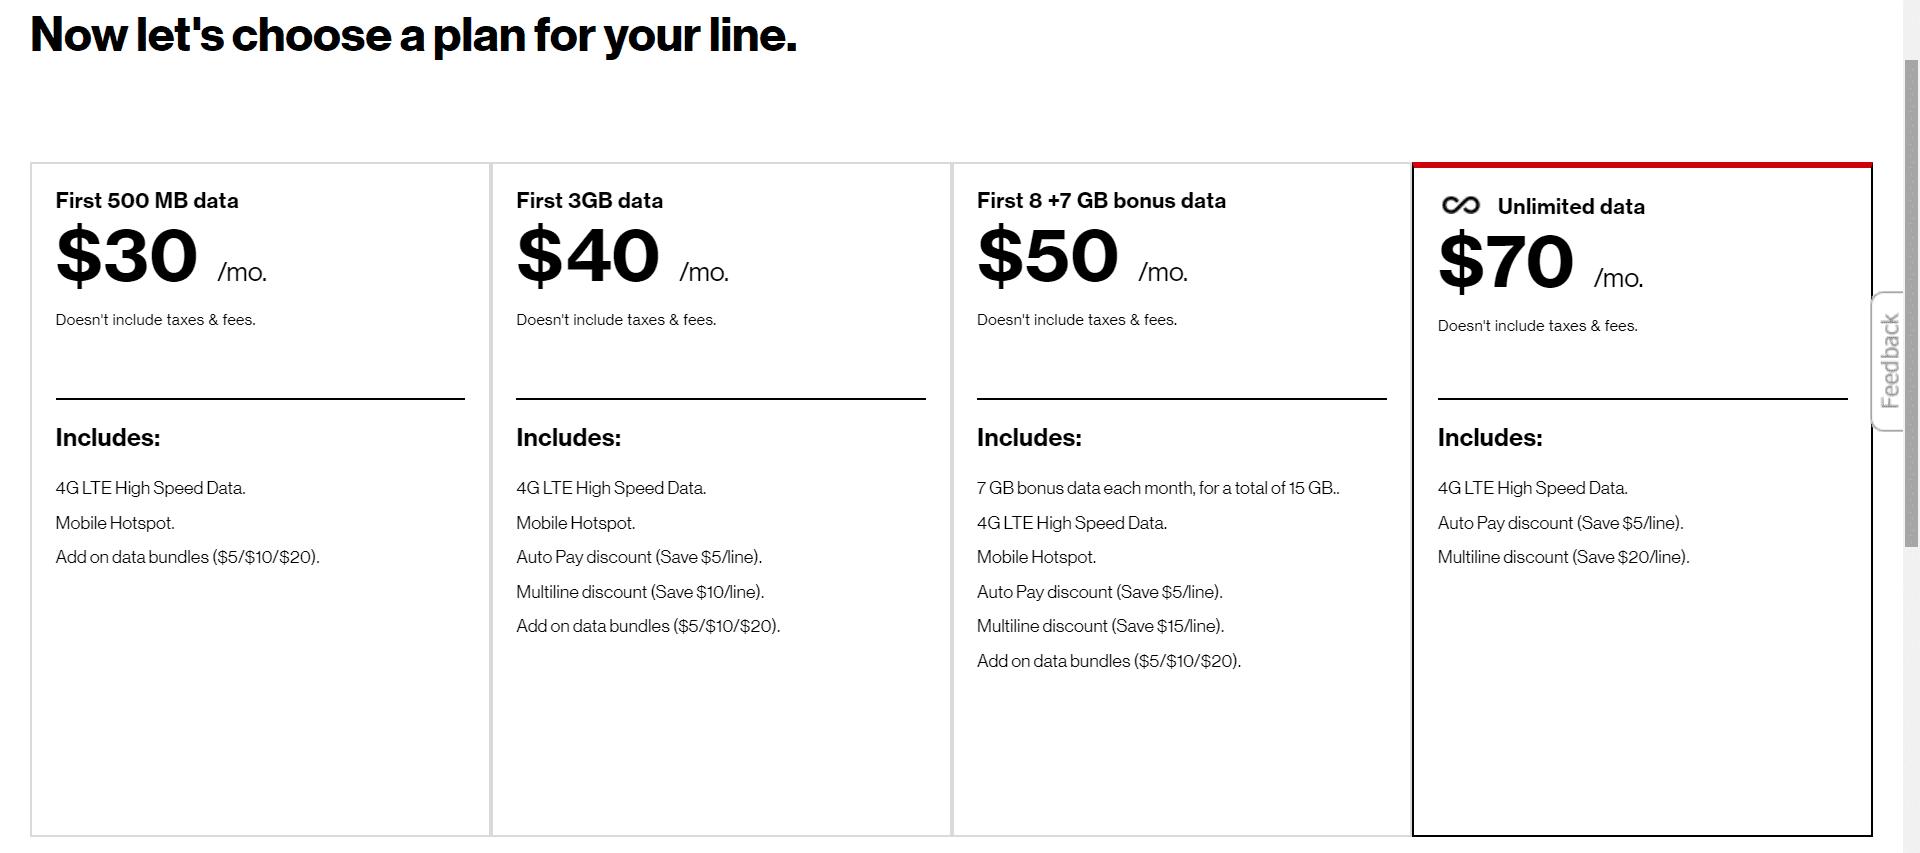 Verizon Unlimited Hotspot Review Broadband Internet On The Go